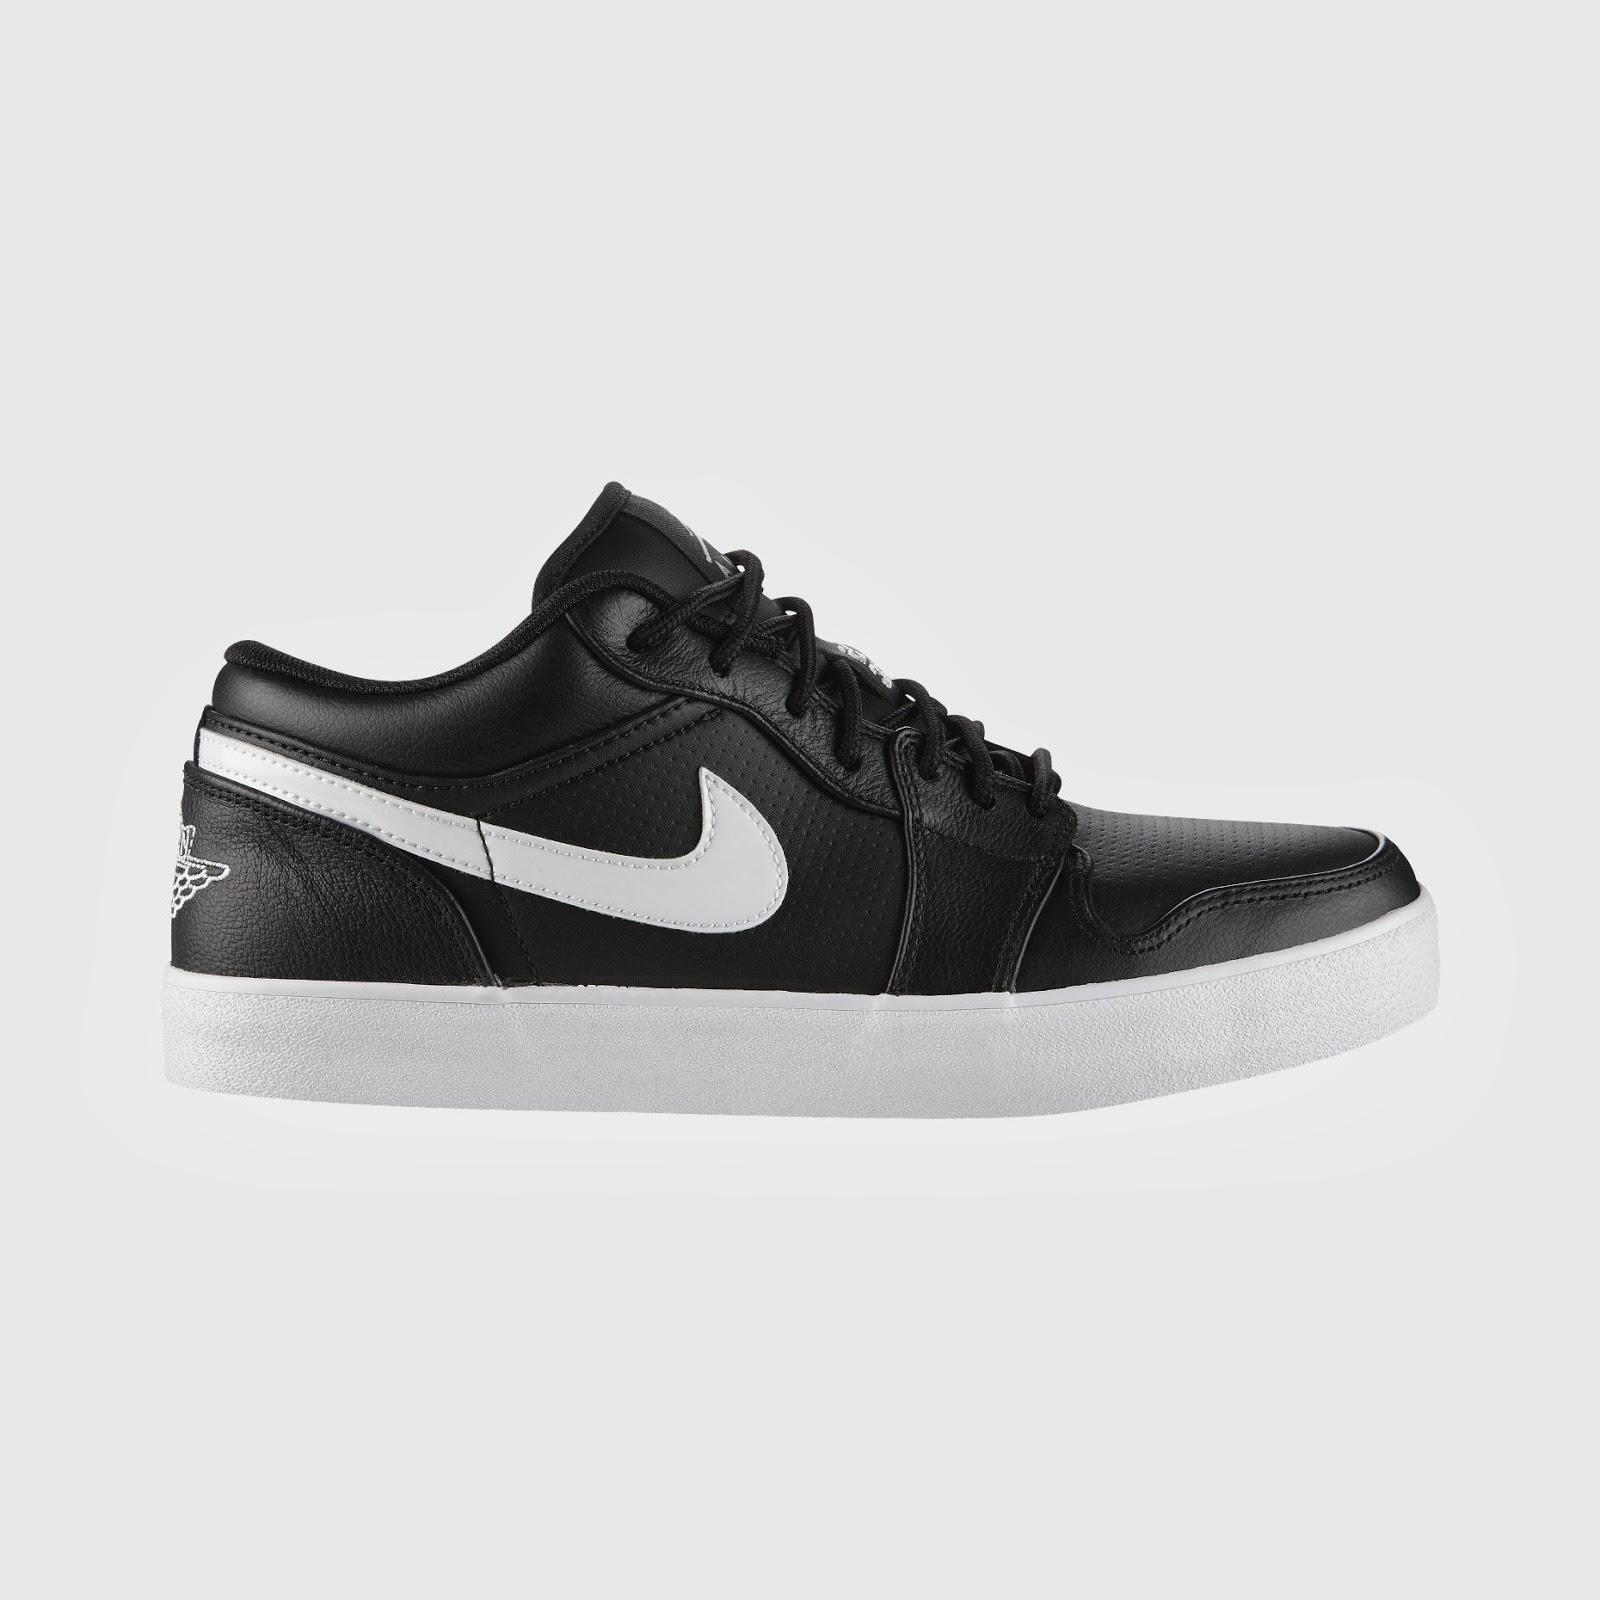 Air Jordan V.2 Low LTR Men's Shoe  # 584794 - 010